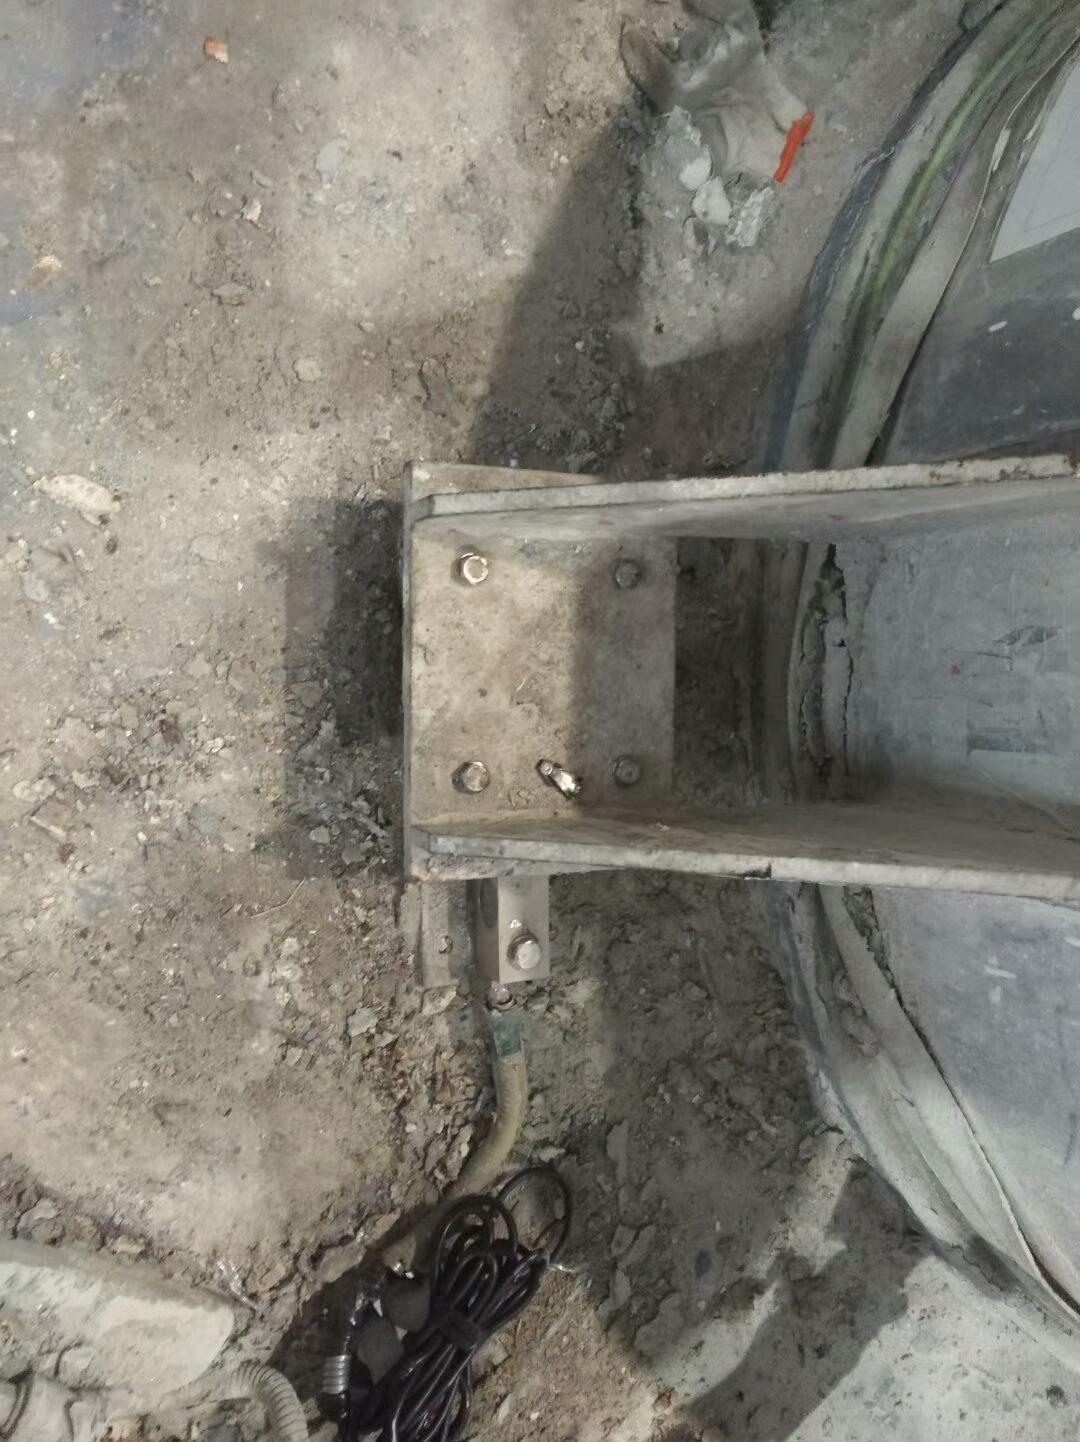 涂料料罐称重模块SB3T安装现场 (3)